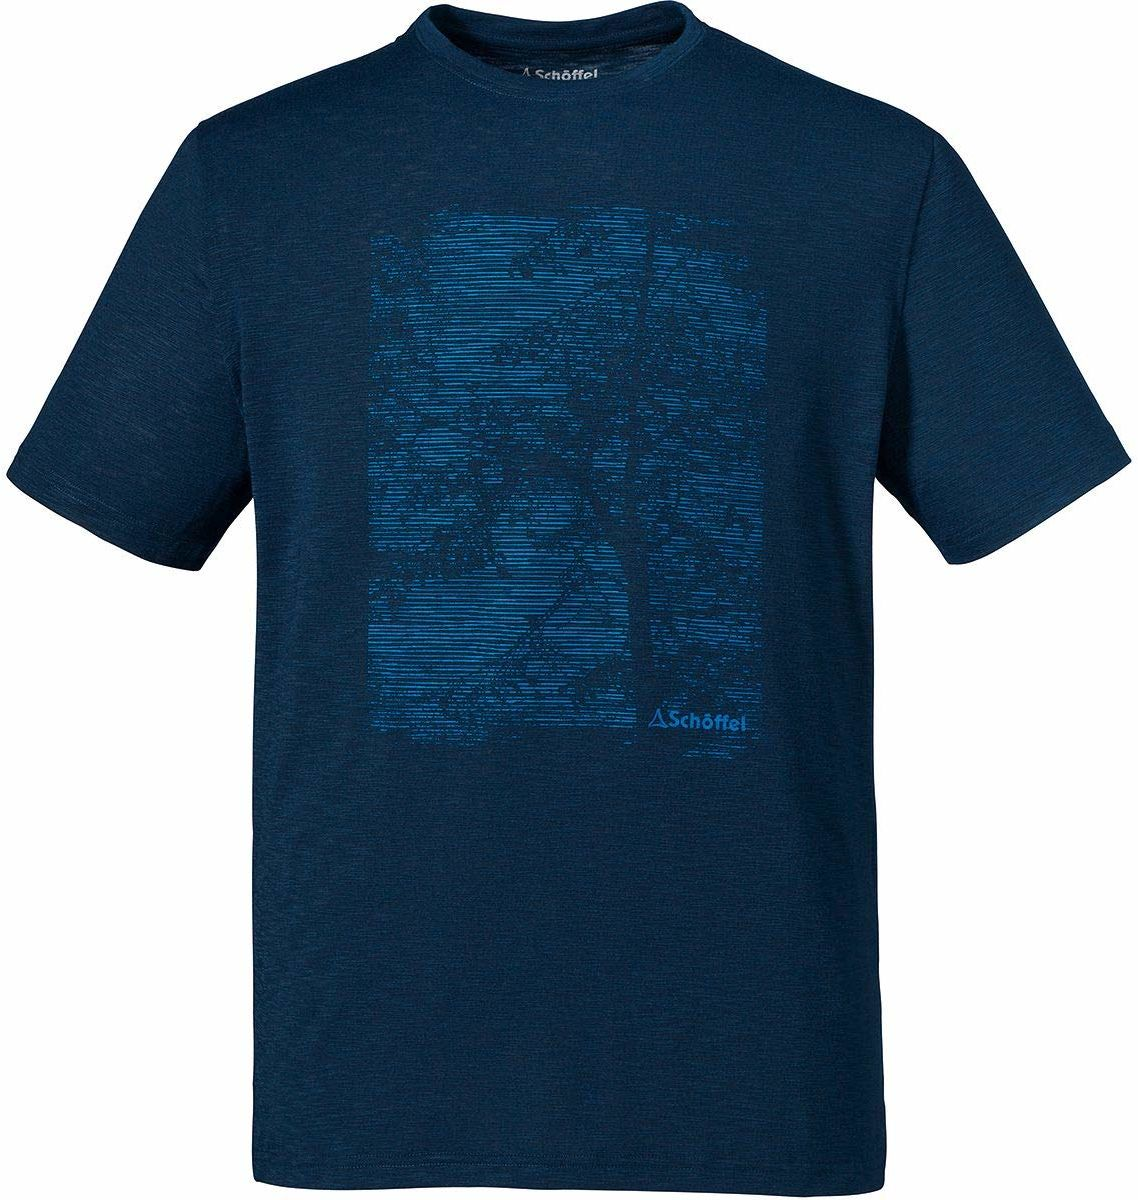 Schöffel Sao Paulo4 T-shirt męski, dress blues, 54